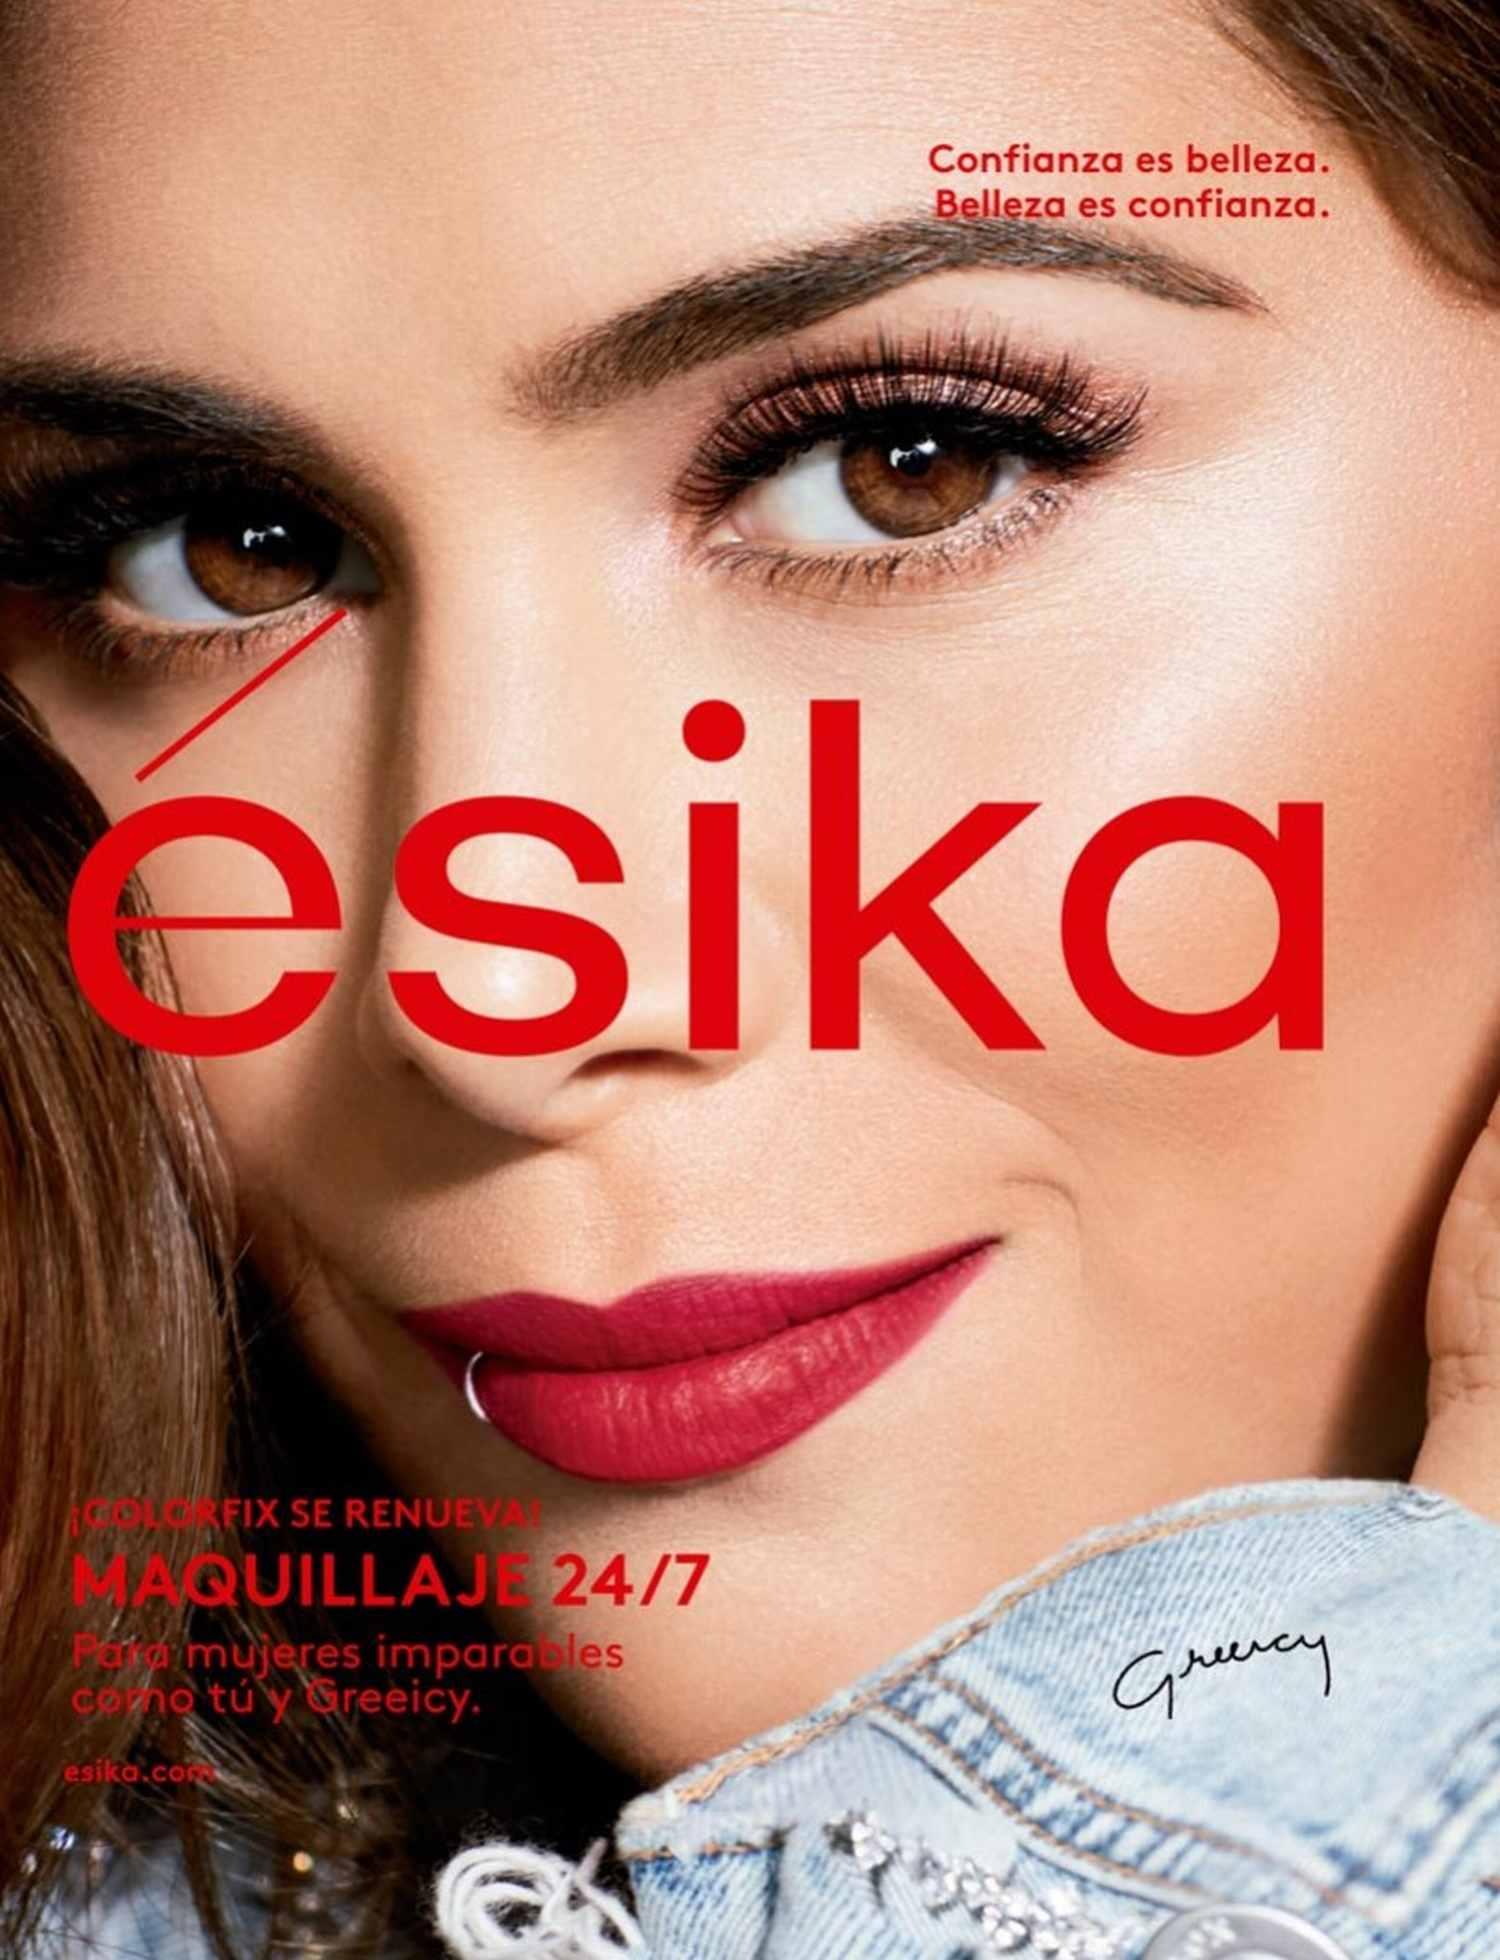 Catálogo Esika Campaña 15 2021 Colombia